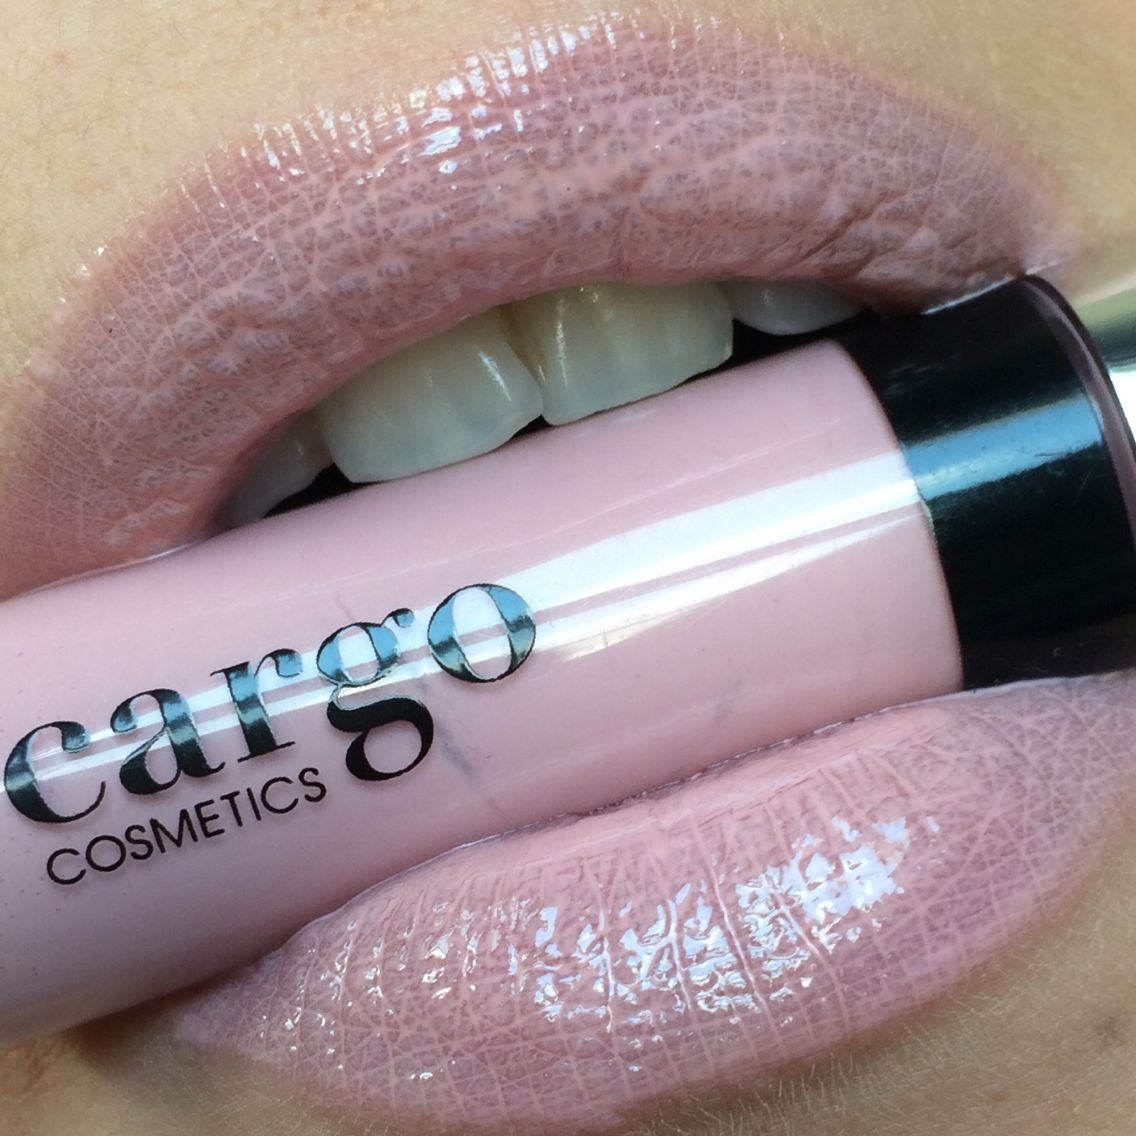 ELF Ex-tra Lip Gloss - Brett Review | Lip swatches, Lips